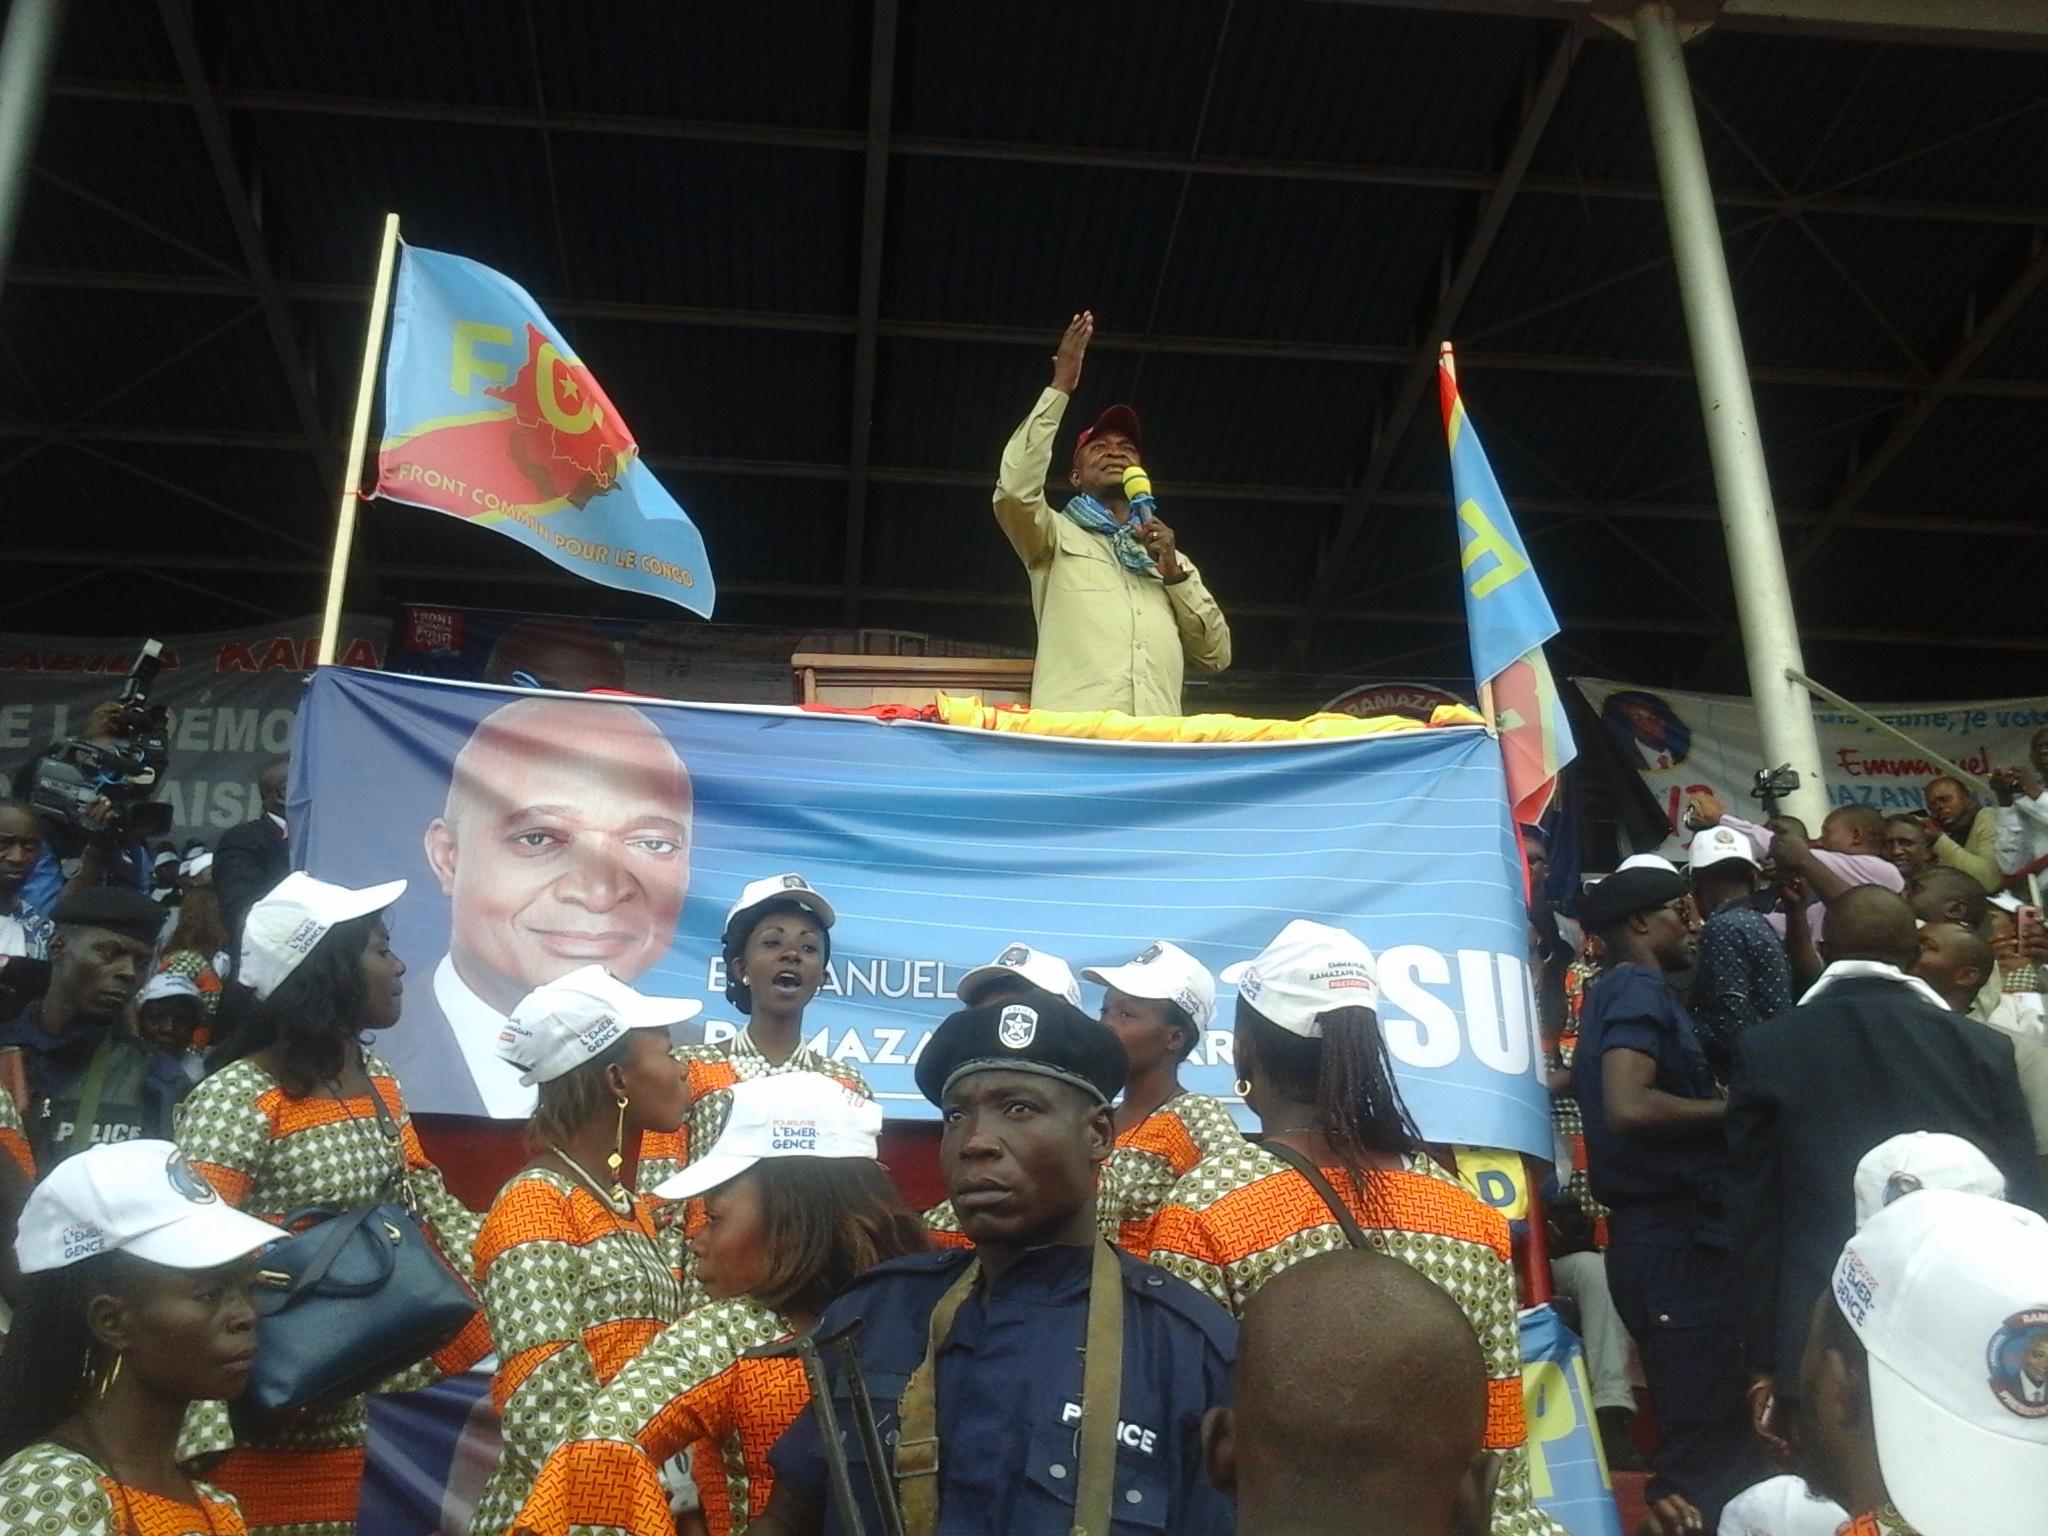 « Je suis déjà élu »  Ramazani Shadari au stade de la Kenya de Lubumbashi